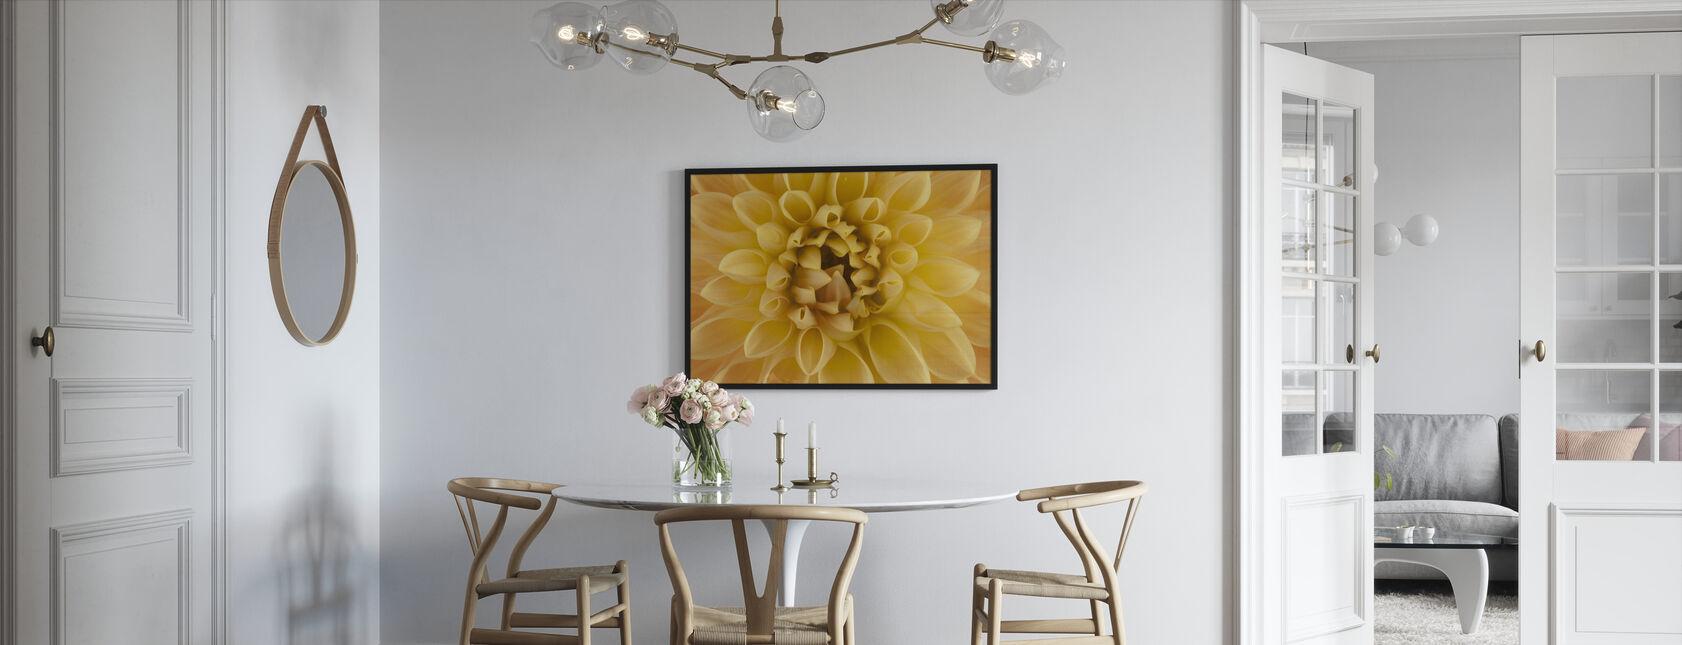 Amber Dahlia - Framed print - Kitchen